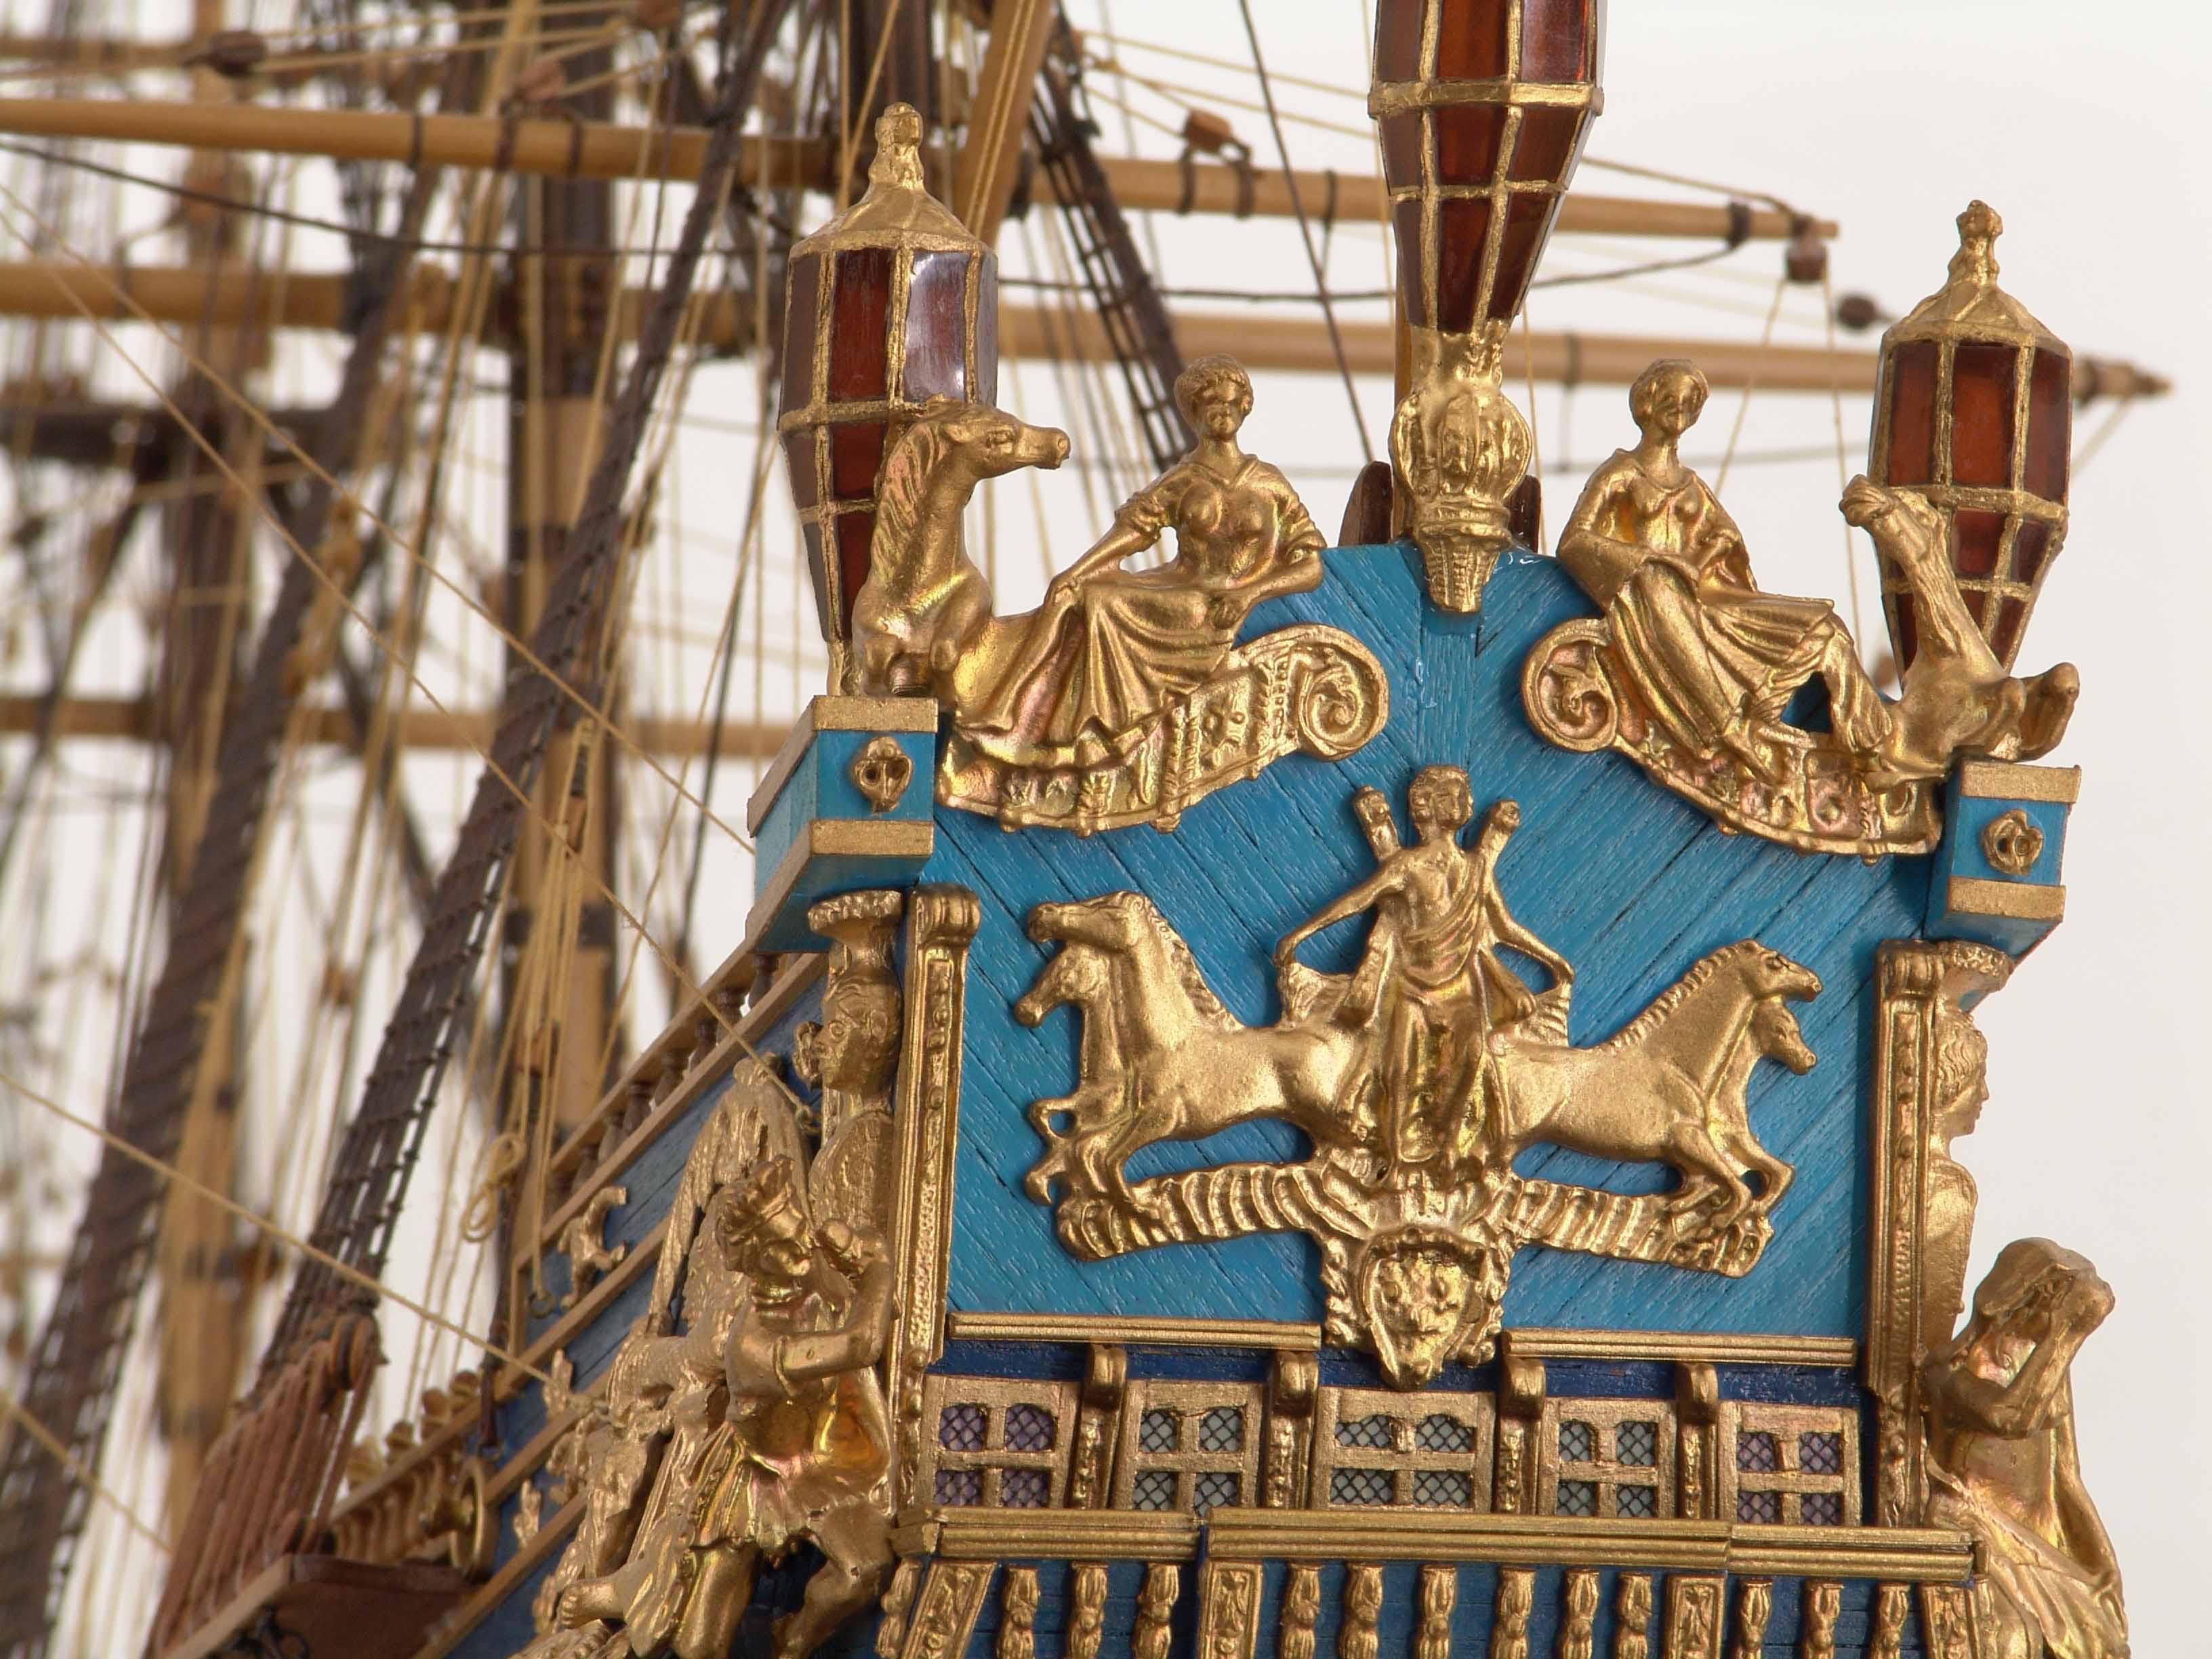 Detail views of ship model Soleil Royal